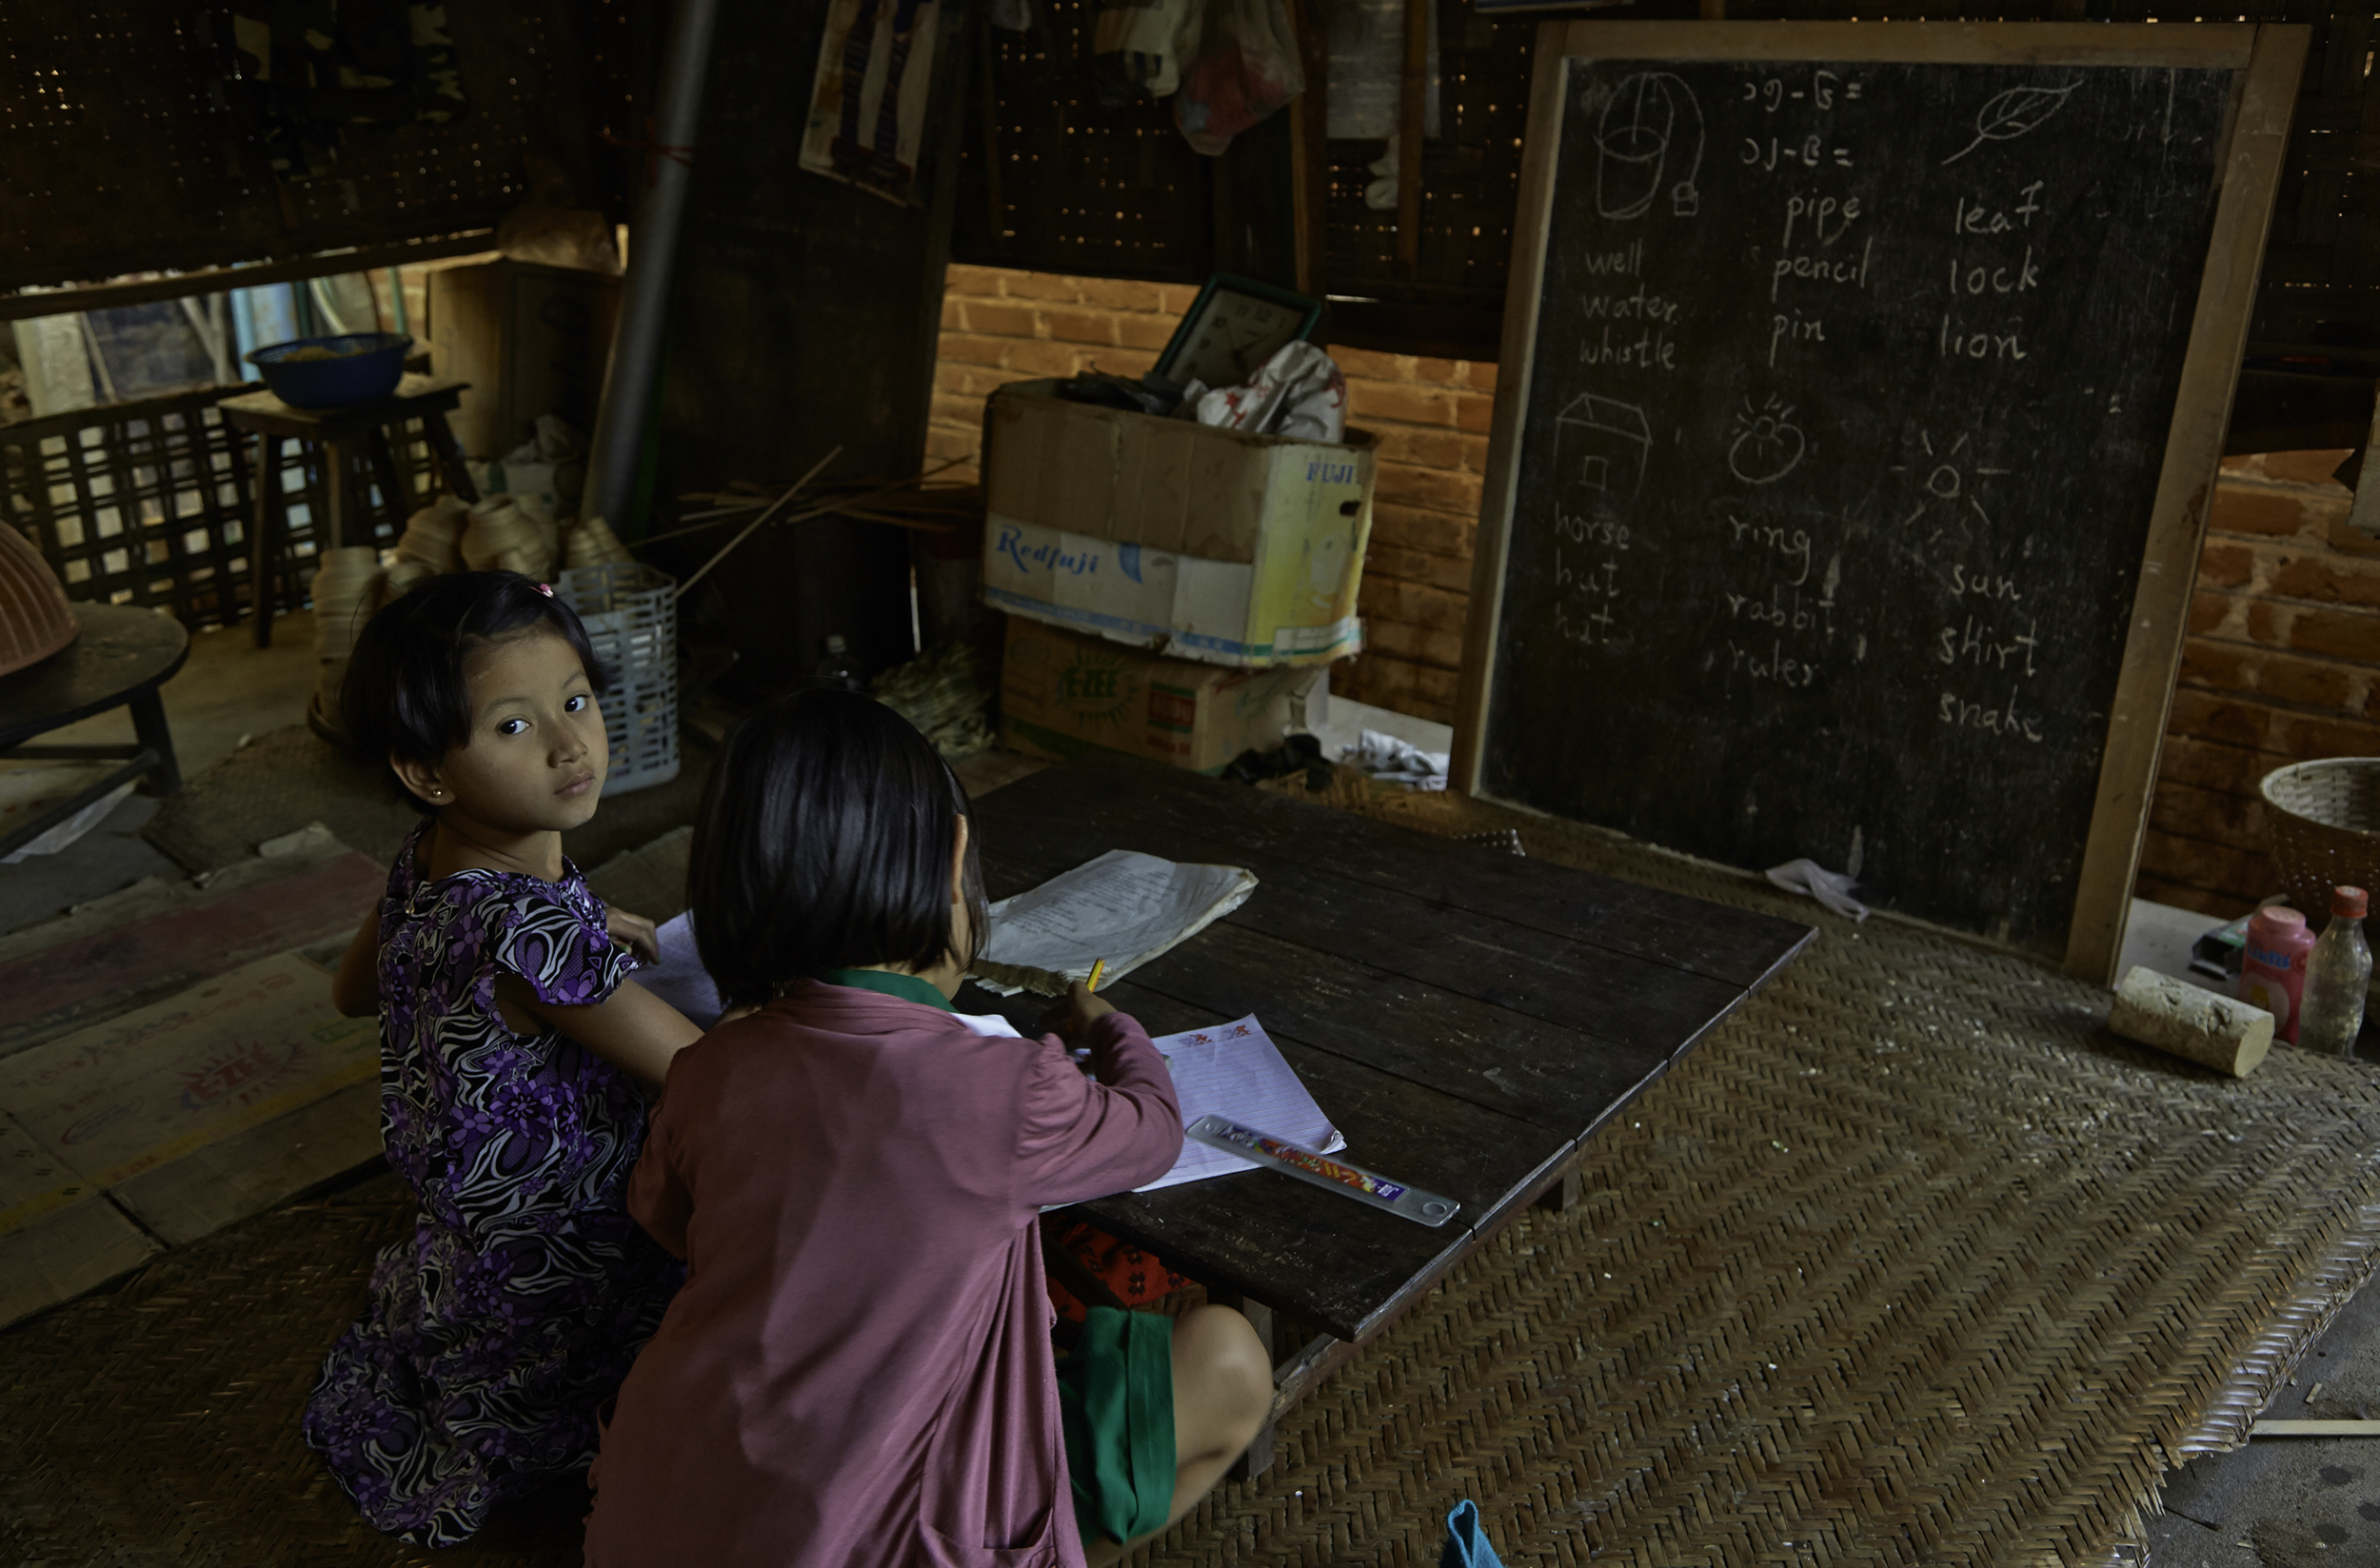 Kanjana Chaiwatanachai Image Works_Bagan PM_2014.01.16_0151w.jpg